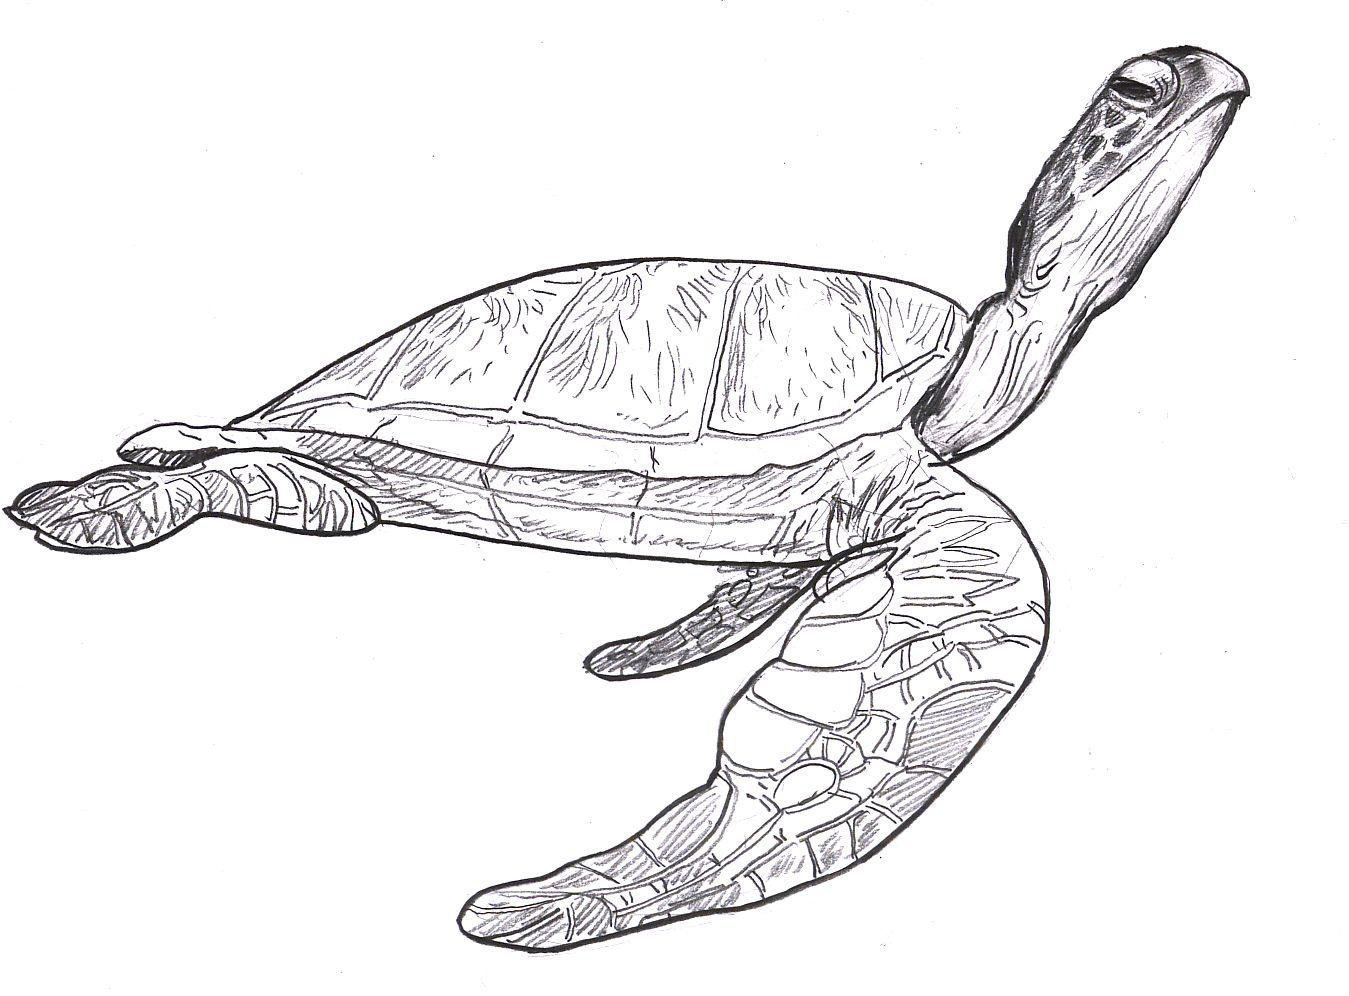 sea turtle drawing pictures | SEA TURTLES! SEA TURTLE ...